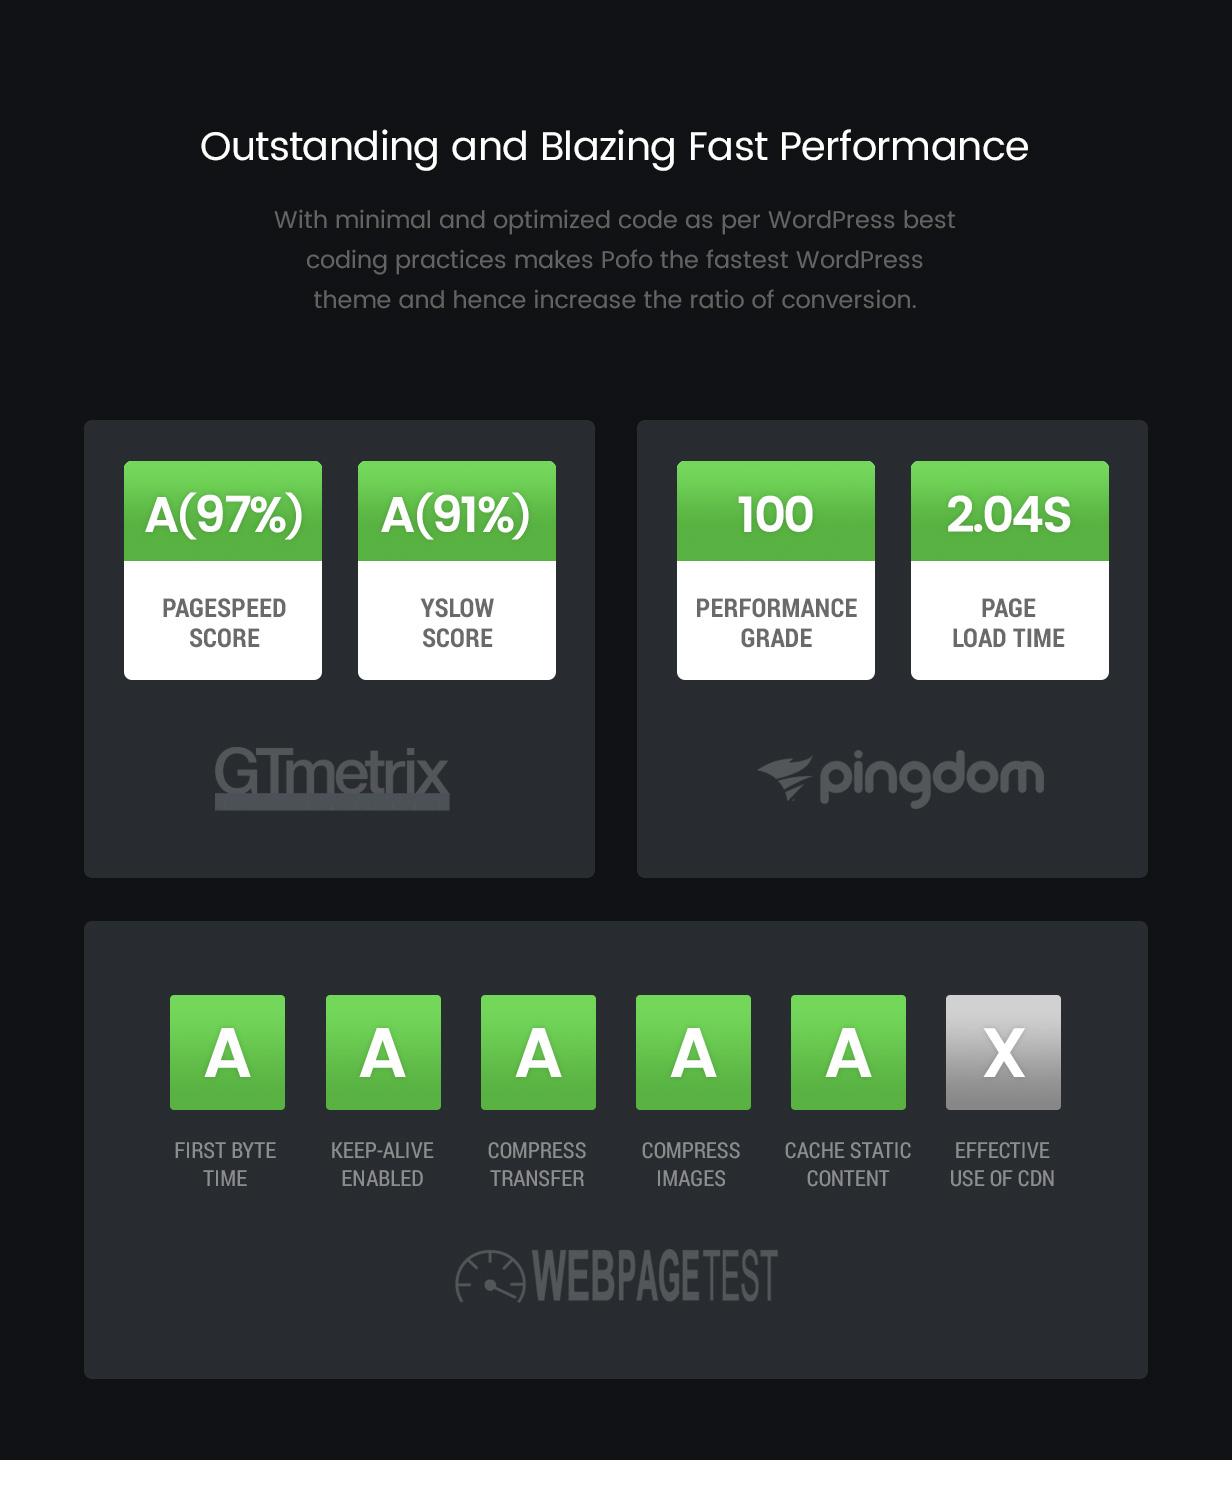 pofo wordpress fast performance v2 - Pofo - Creative Portfolio and Blog WordPress Theme